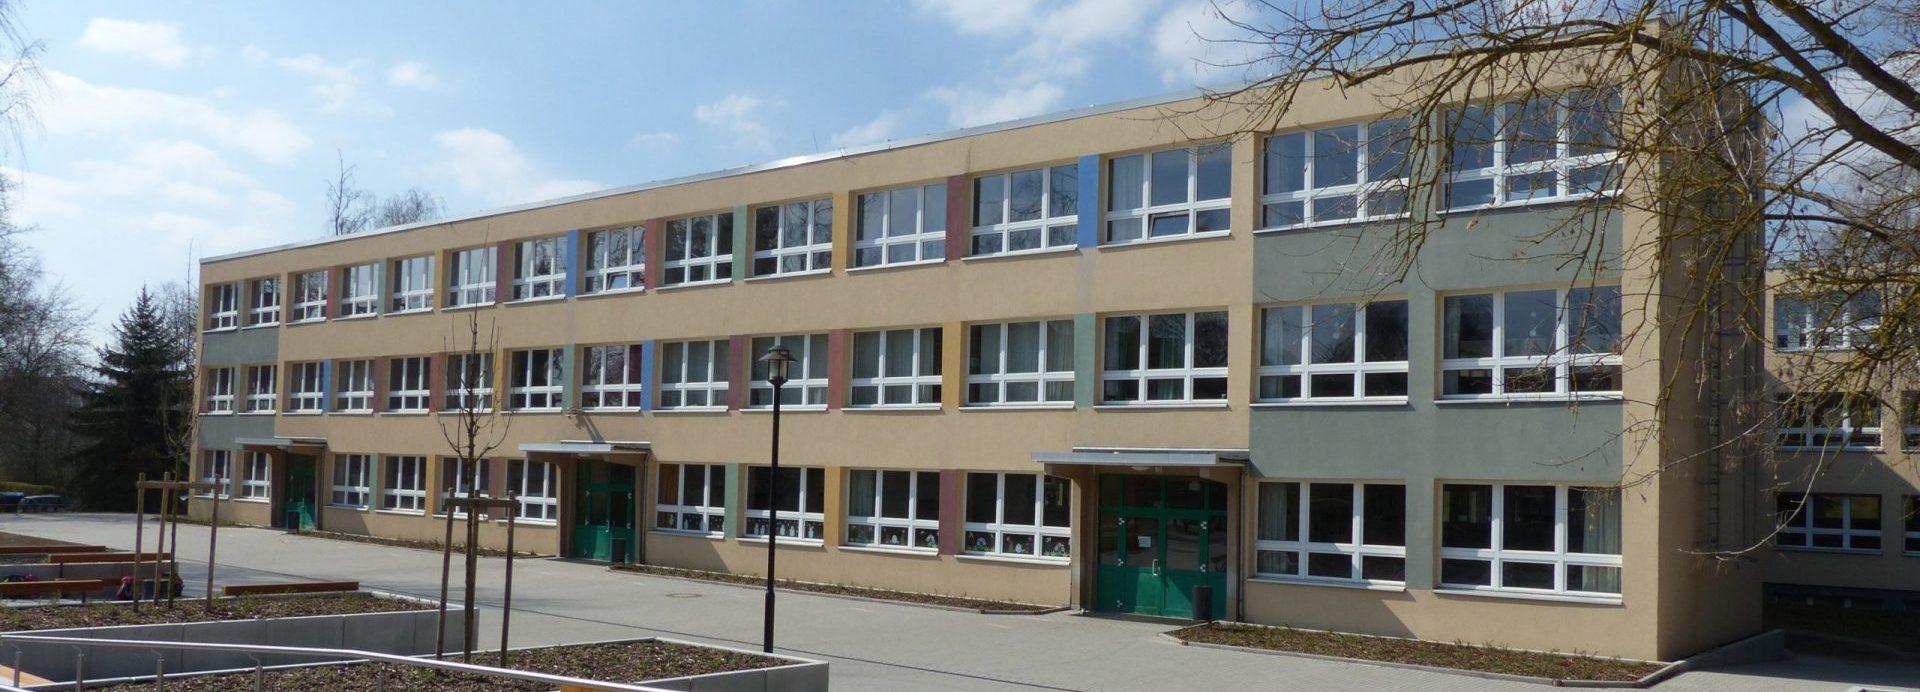 Forstbergschule